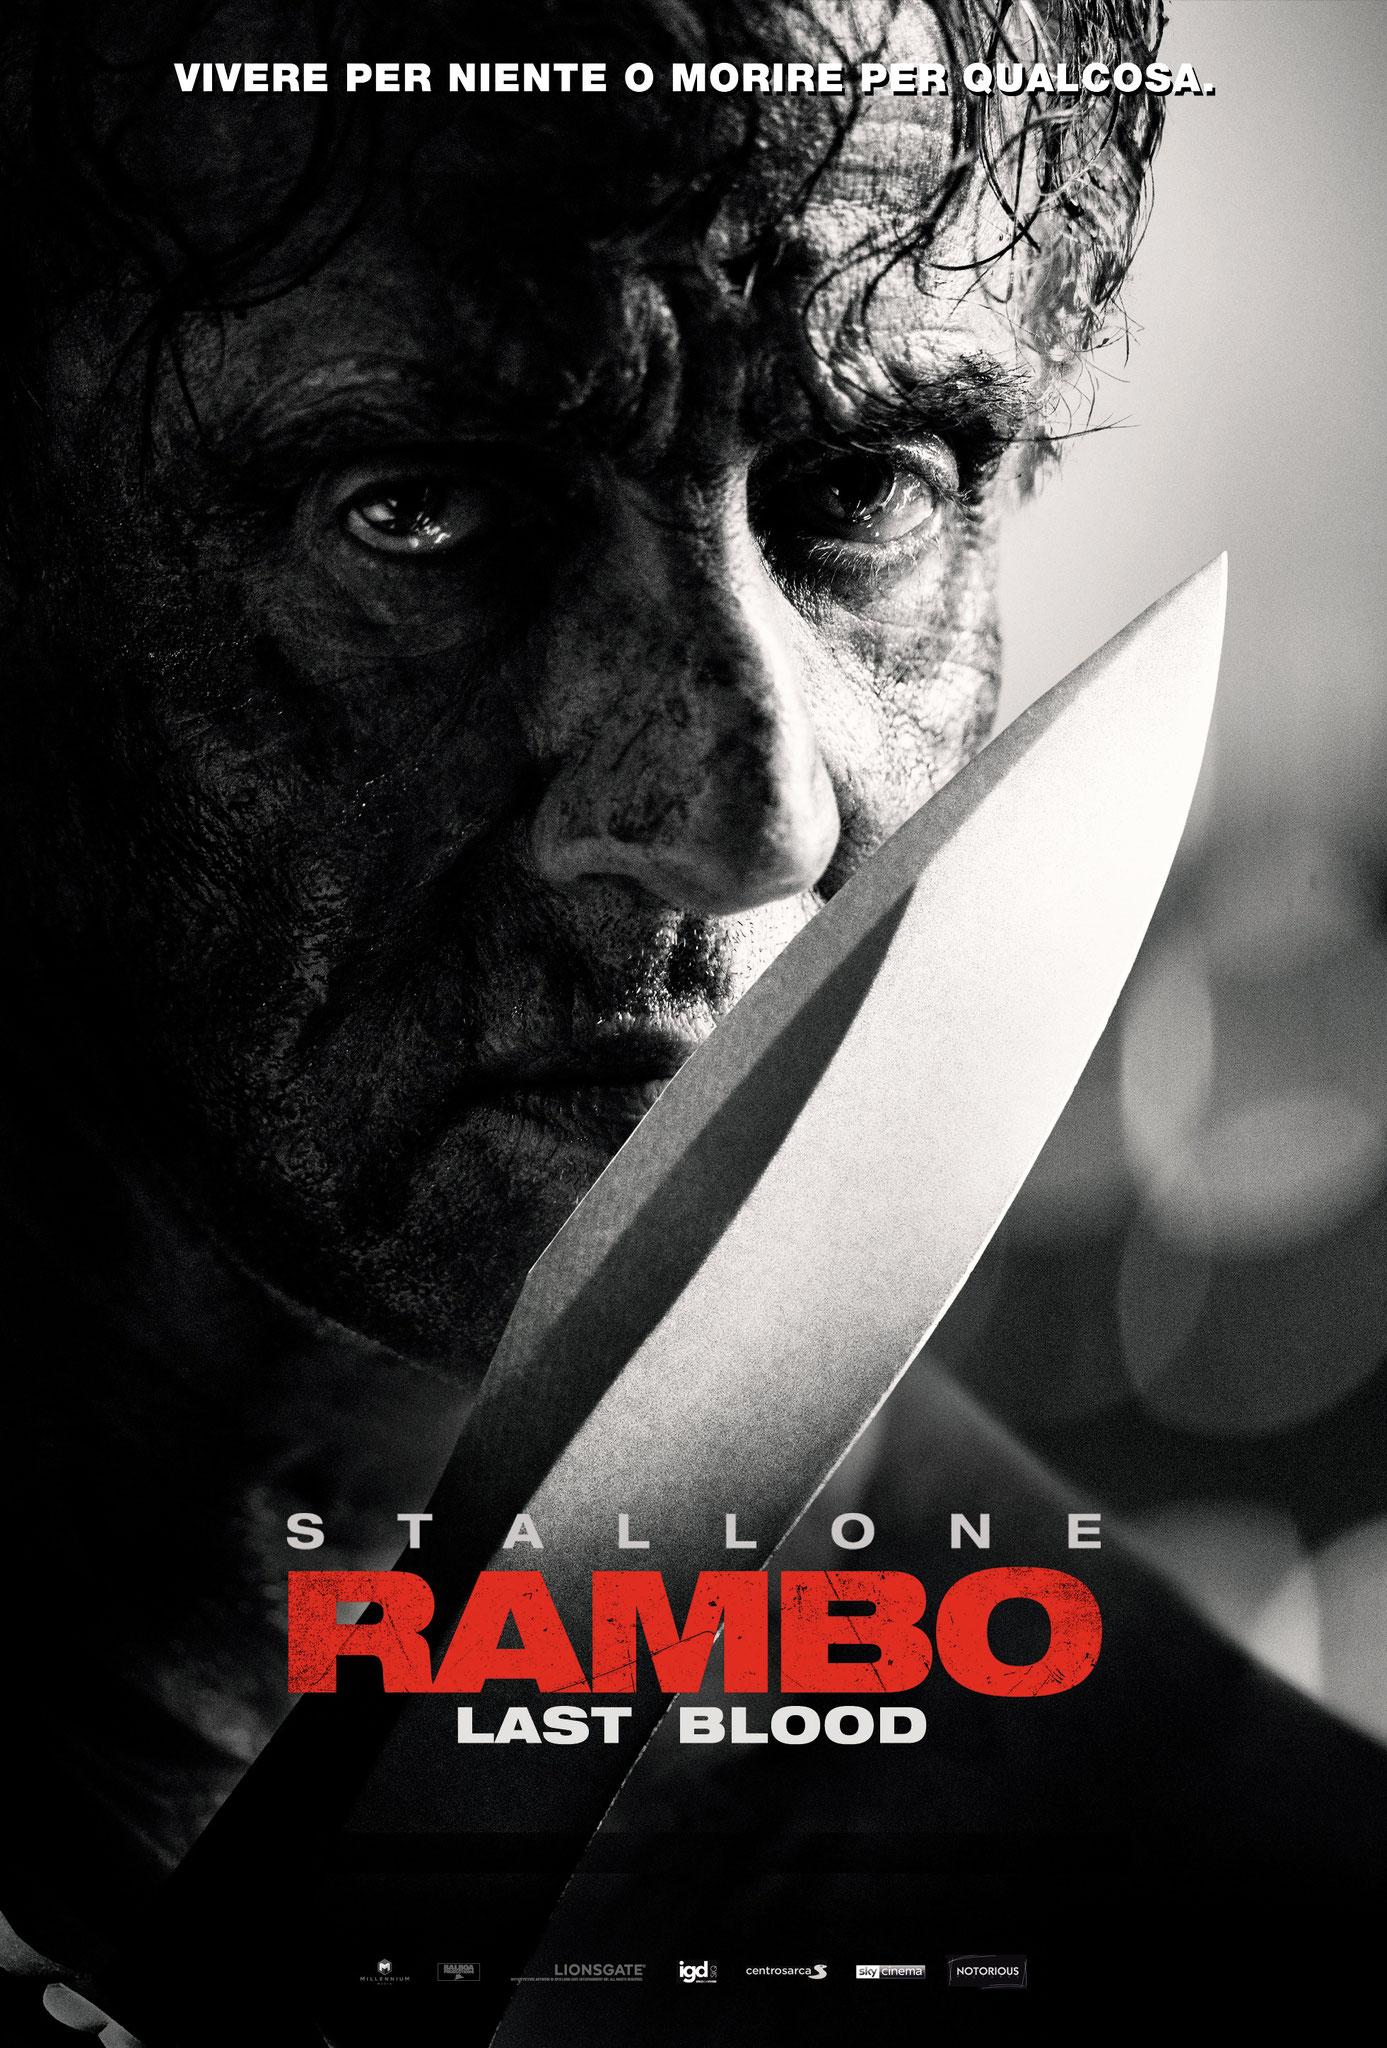 RAMBO LAST BLOOD giovedì 10, venerdì 11, sabato 12, domenica 13: ore 21:15  #Rambo: #LastBlood